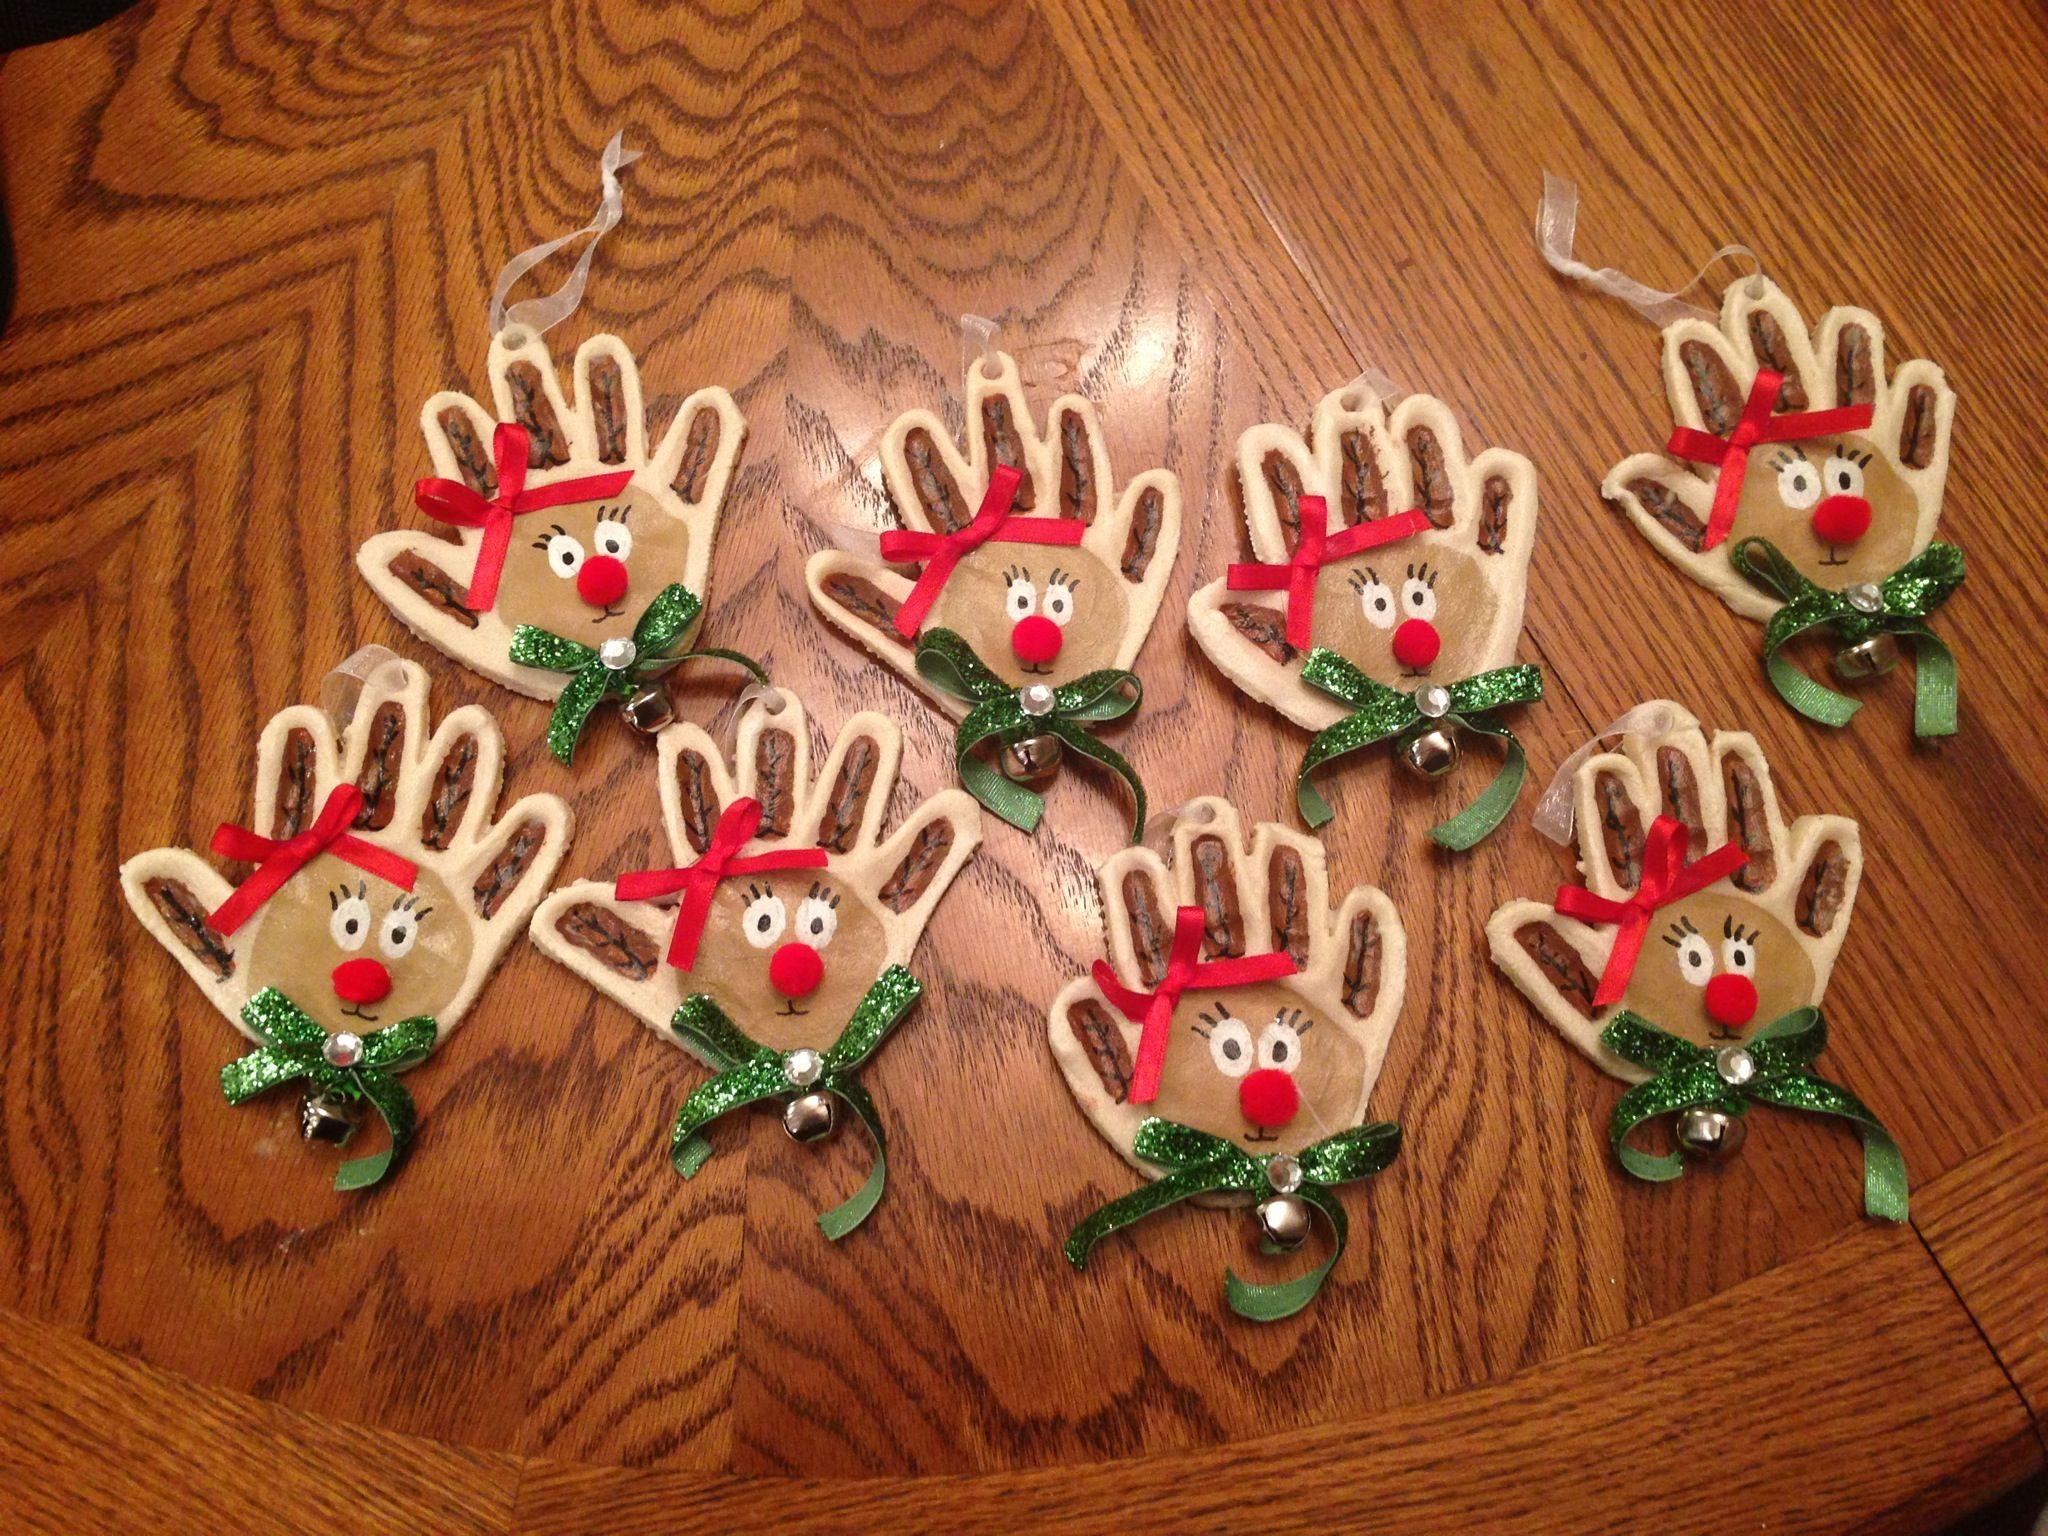 Reindeer Salt Dough Ornaments These Make Me Laugh!